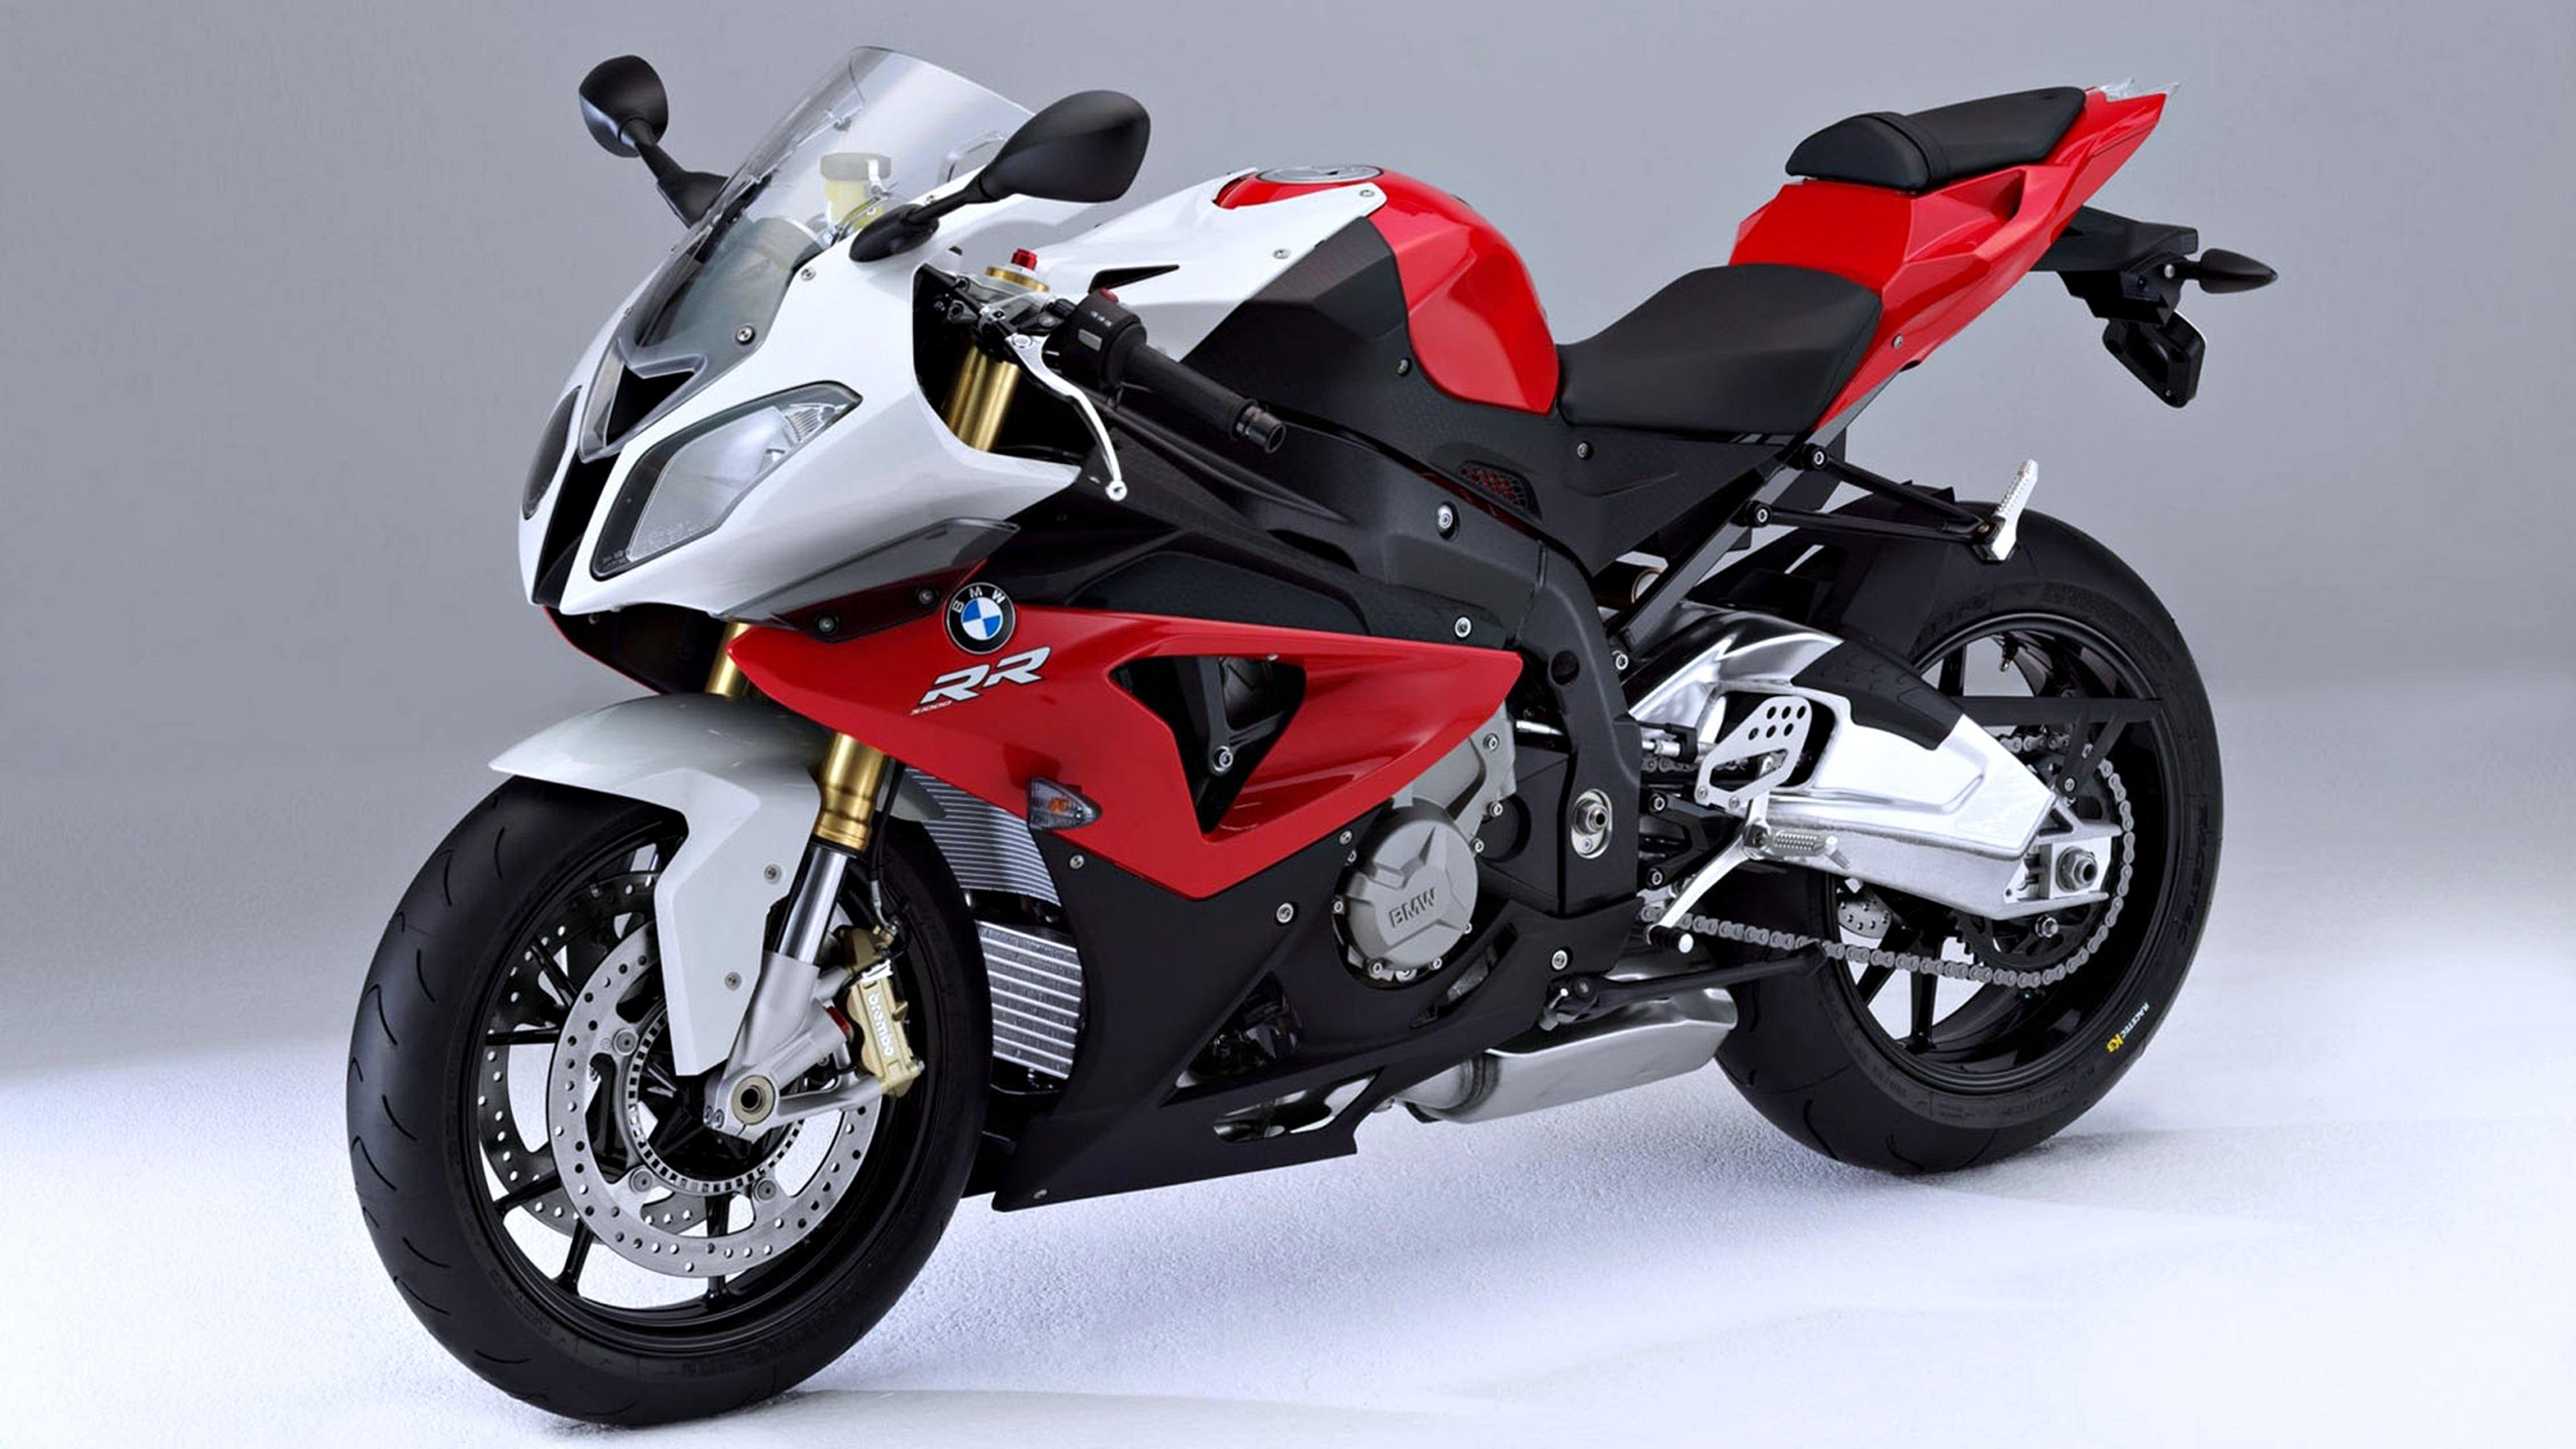 Bmw S1000 Rr Super Bike Motorcycles Race Speed Motors